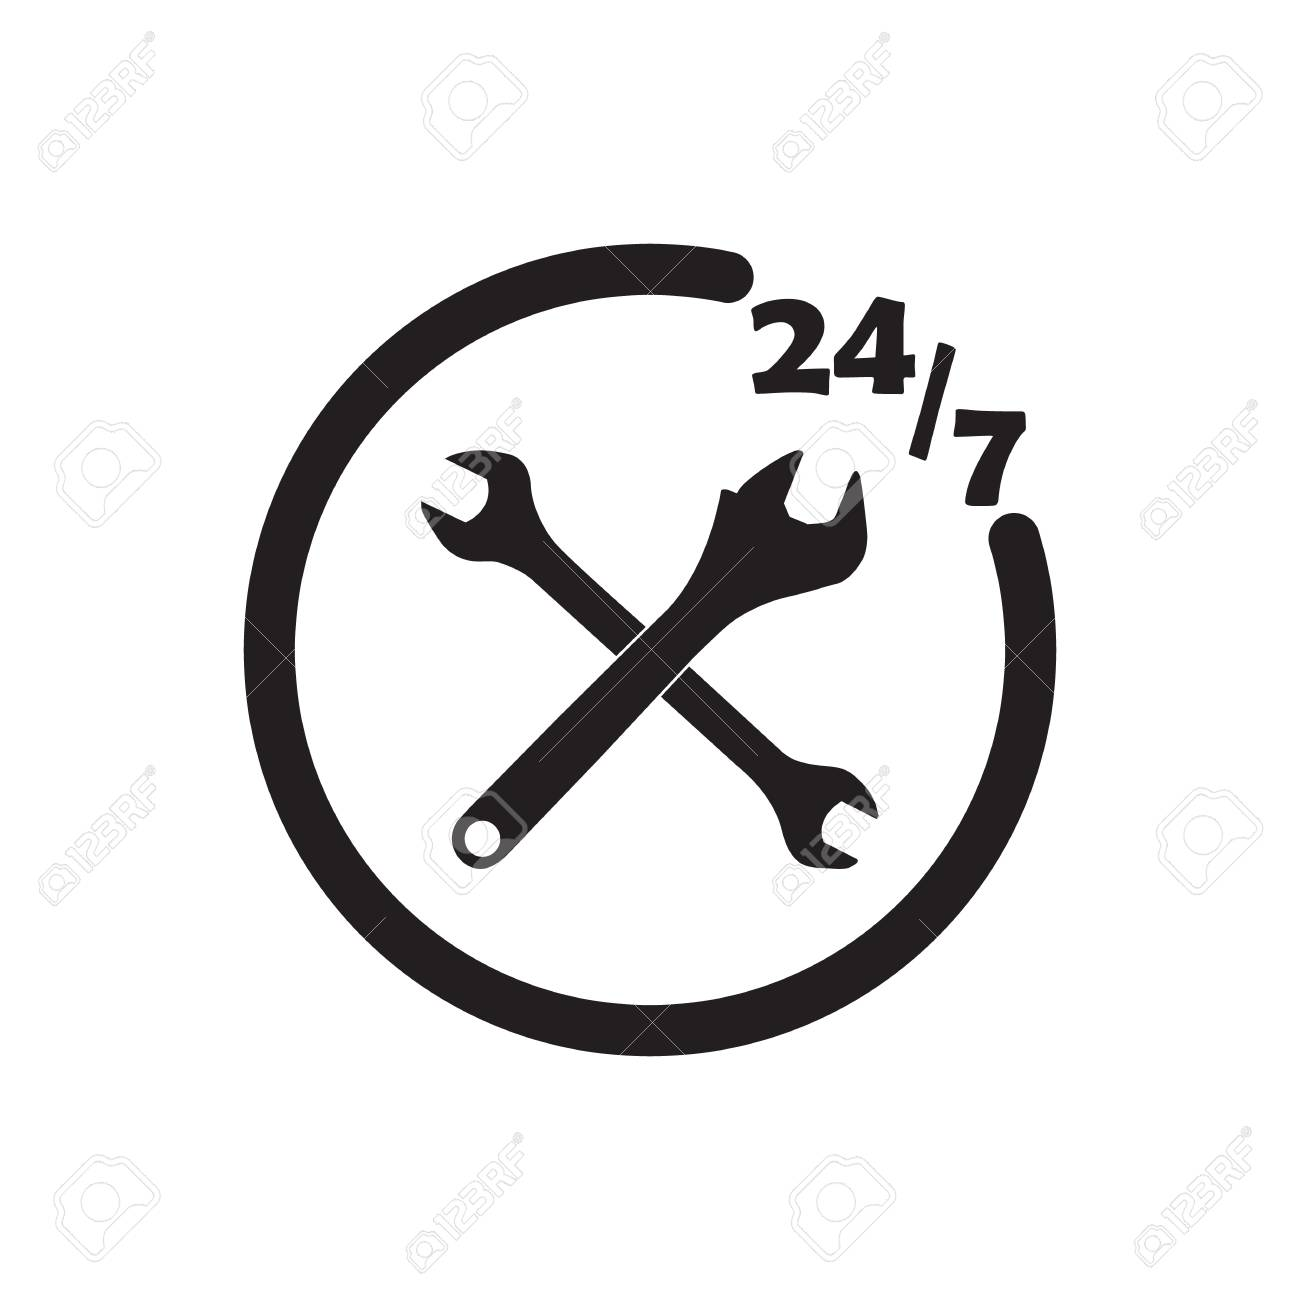 247 technical icon black vector design illustration. - 126398203